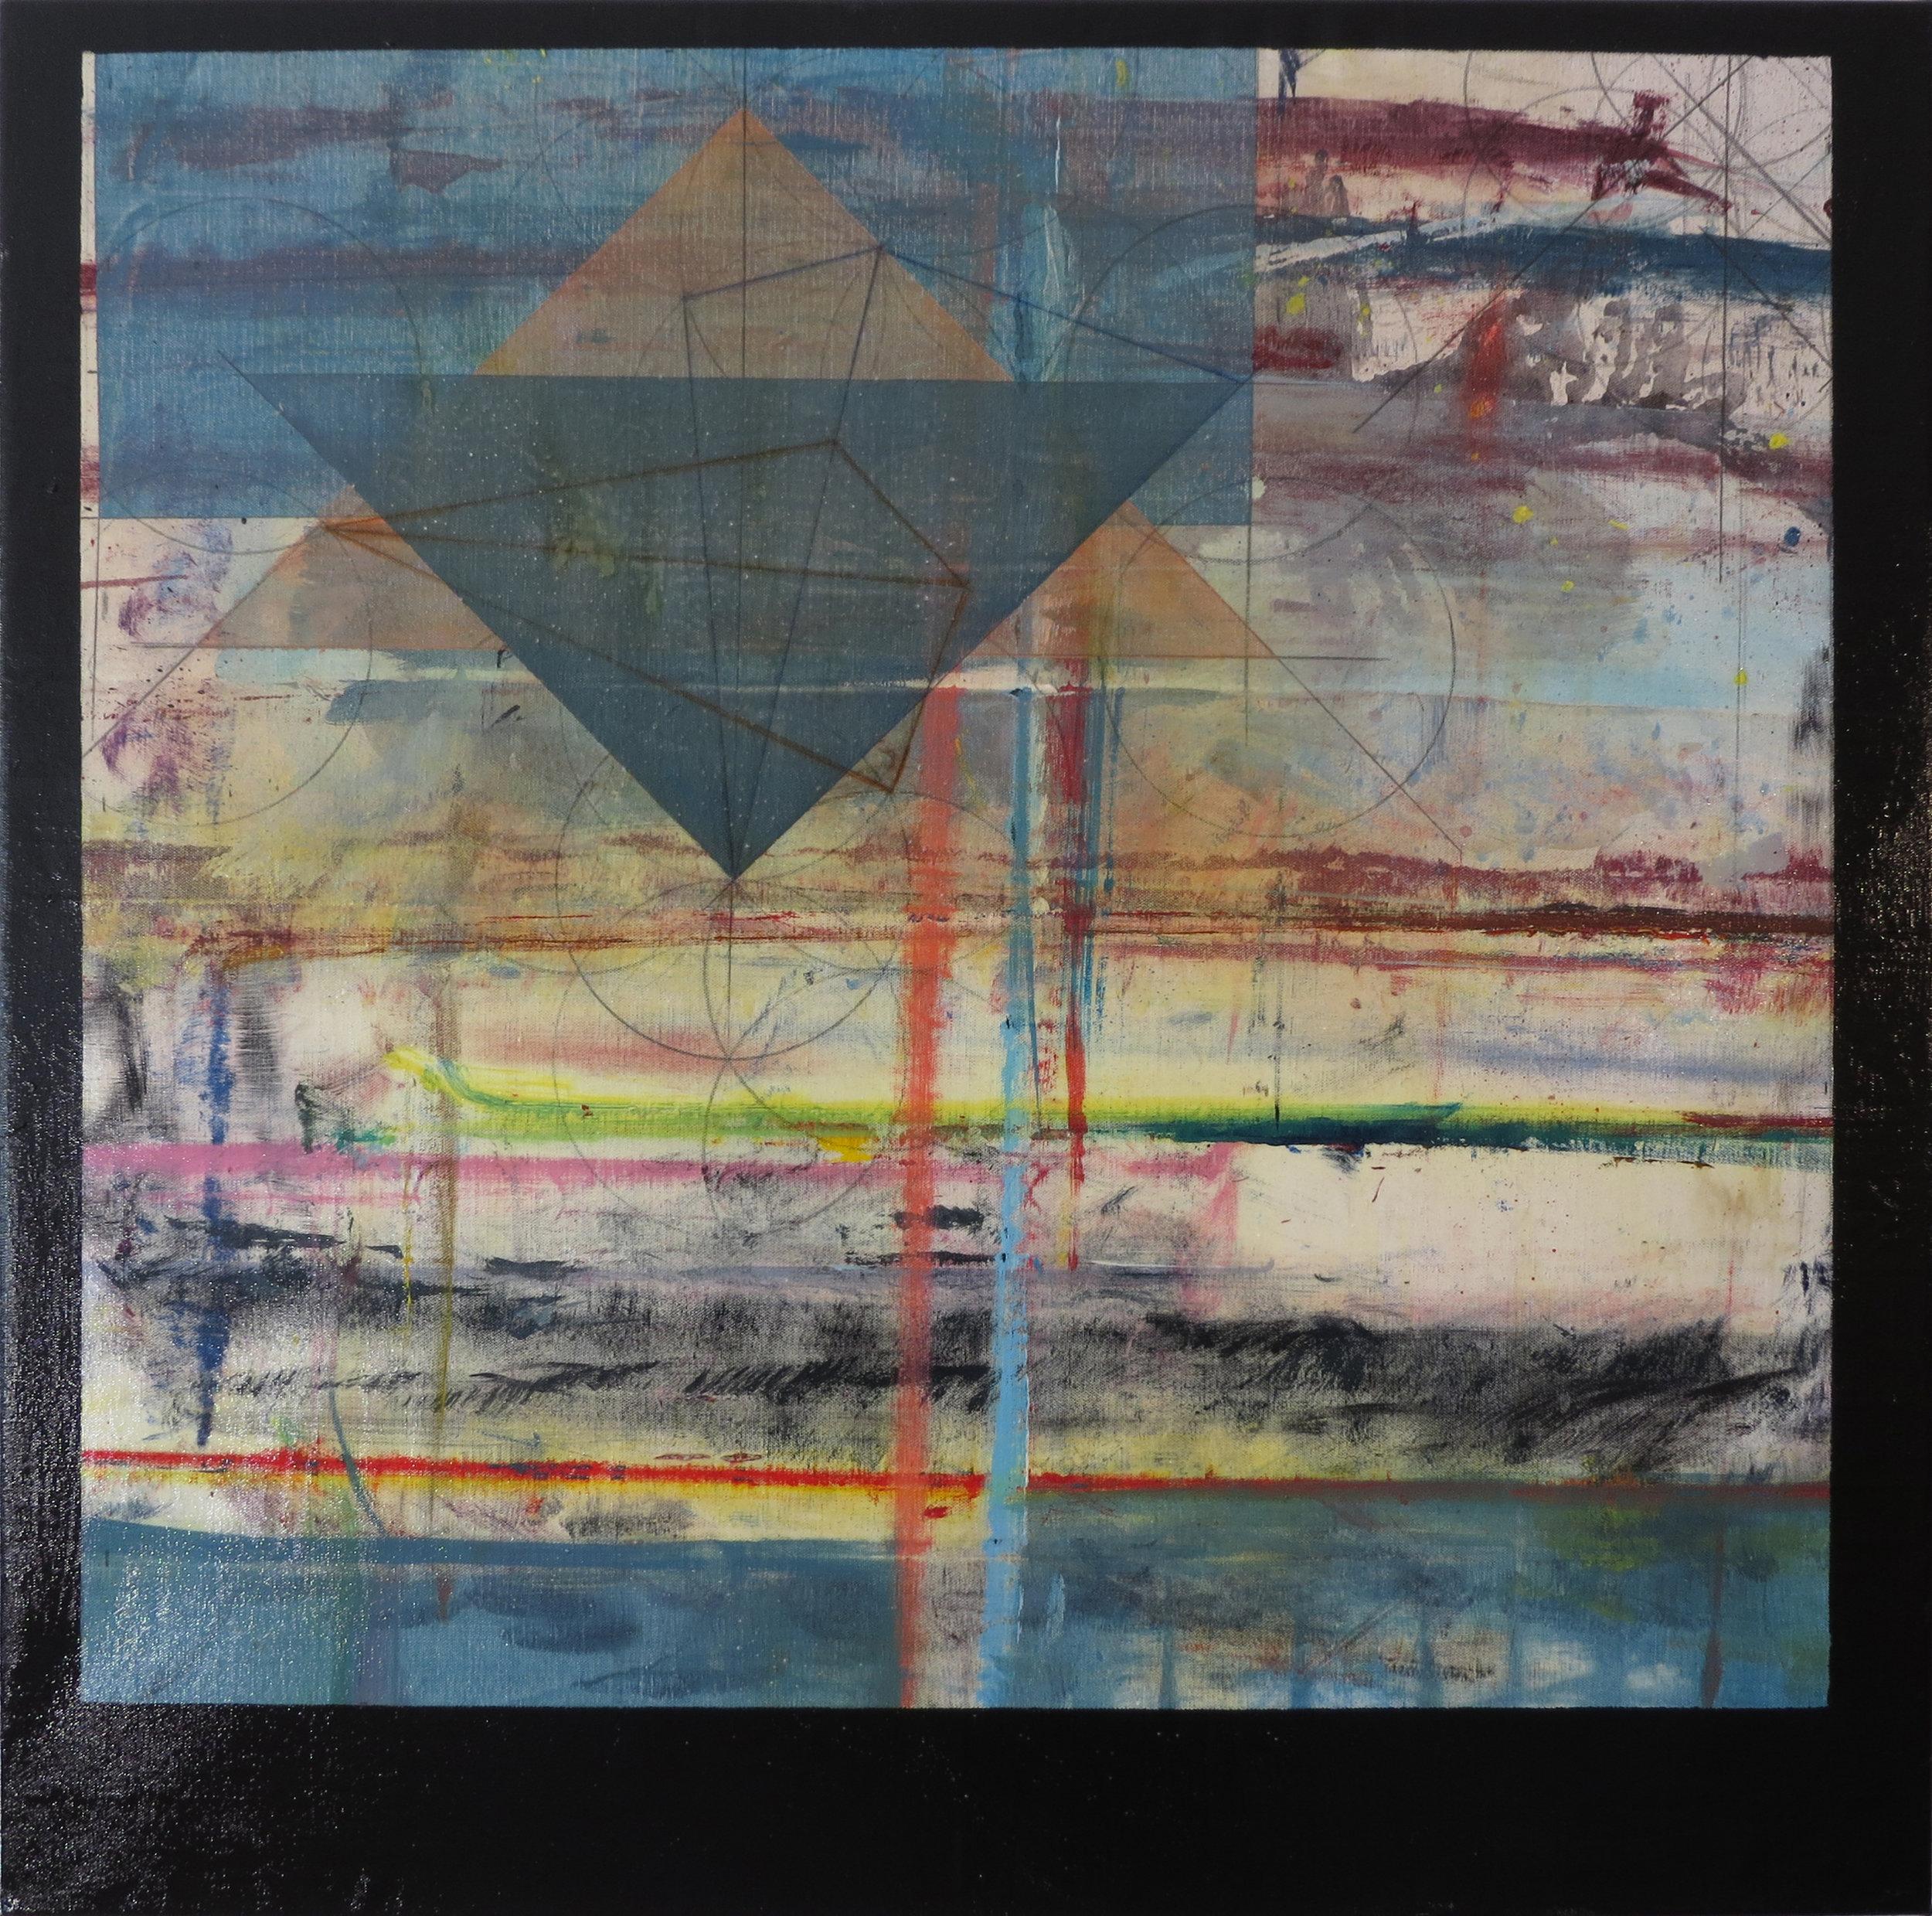 PRISCA   2015  Dream Series  Acrylic, Graphite, Pastel, Varnish, Canvas  30x30